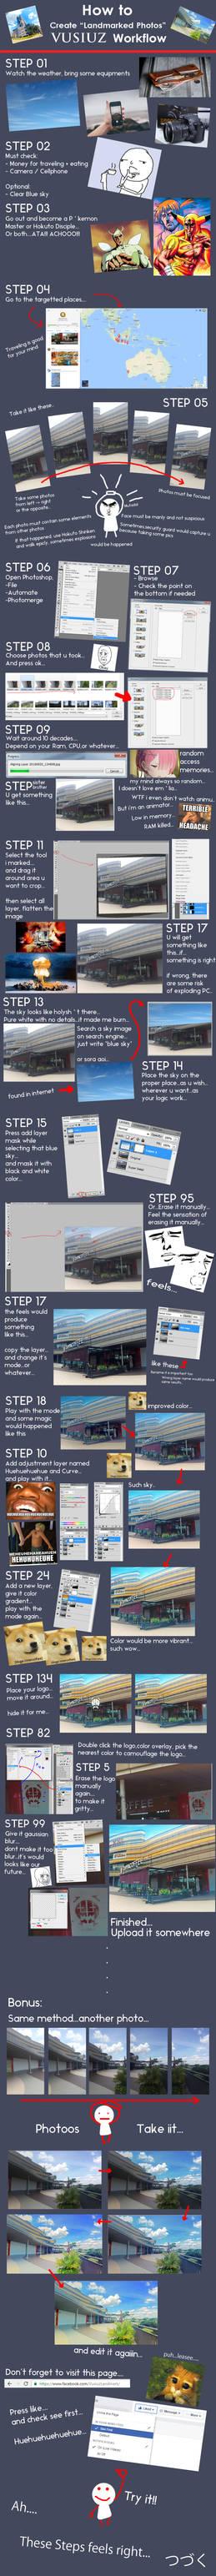 Vusiuz Workflow: How to Create Landmarked Photos!